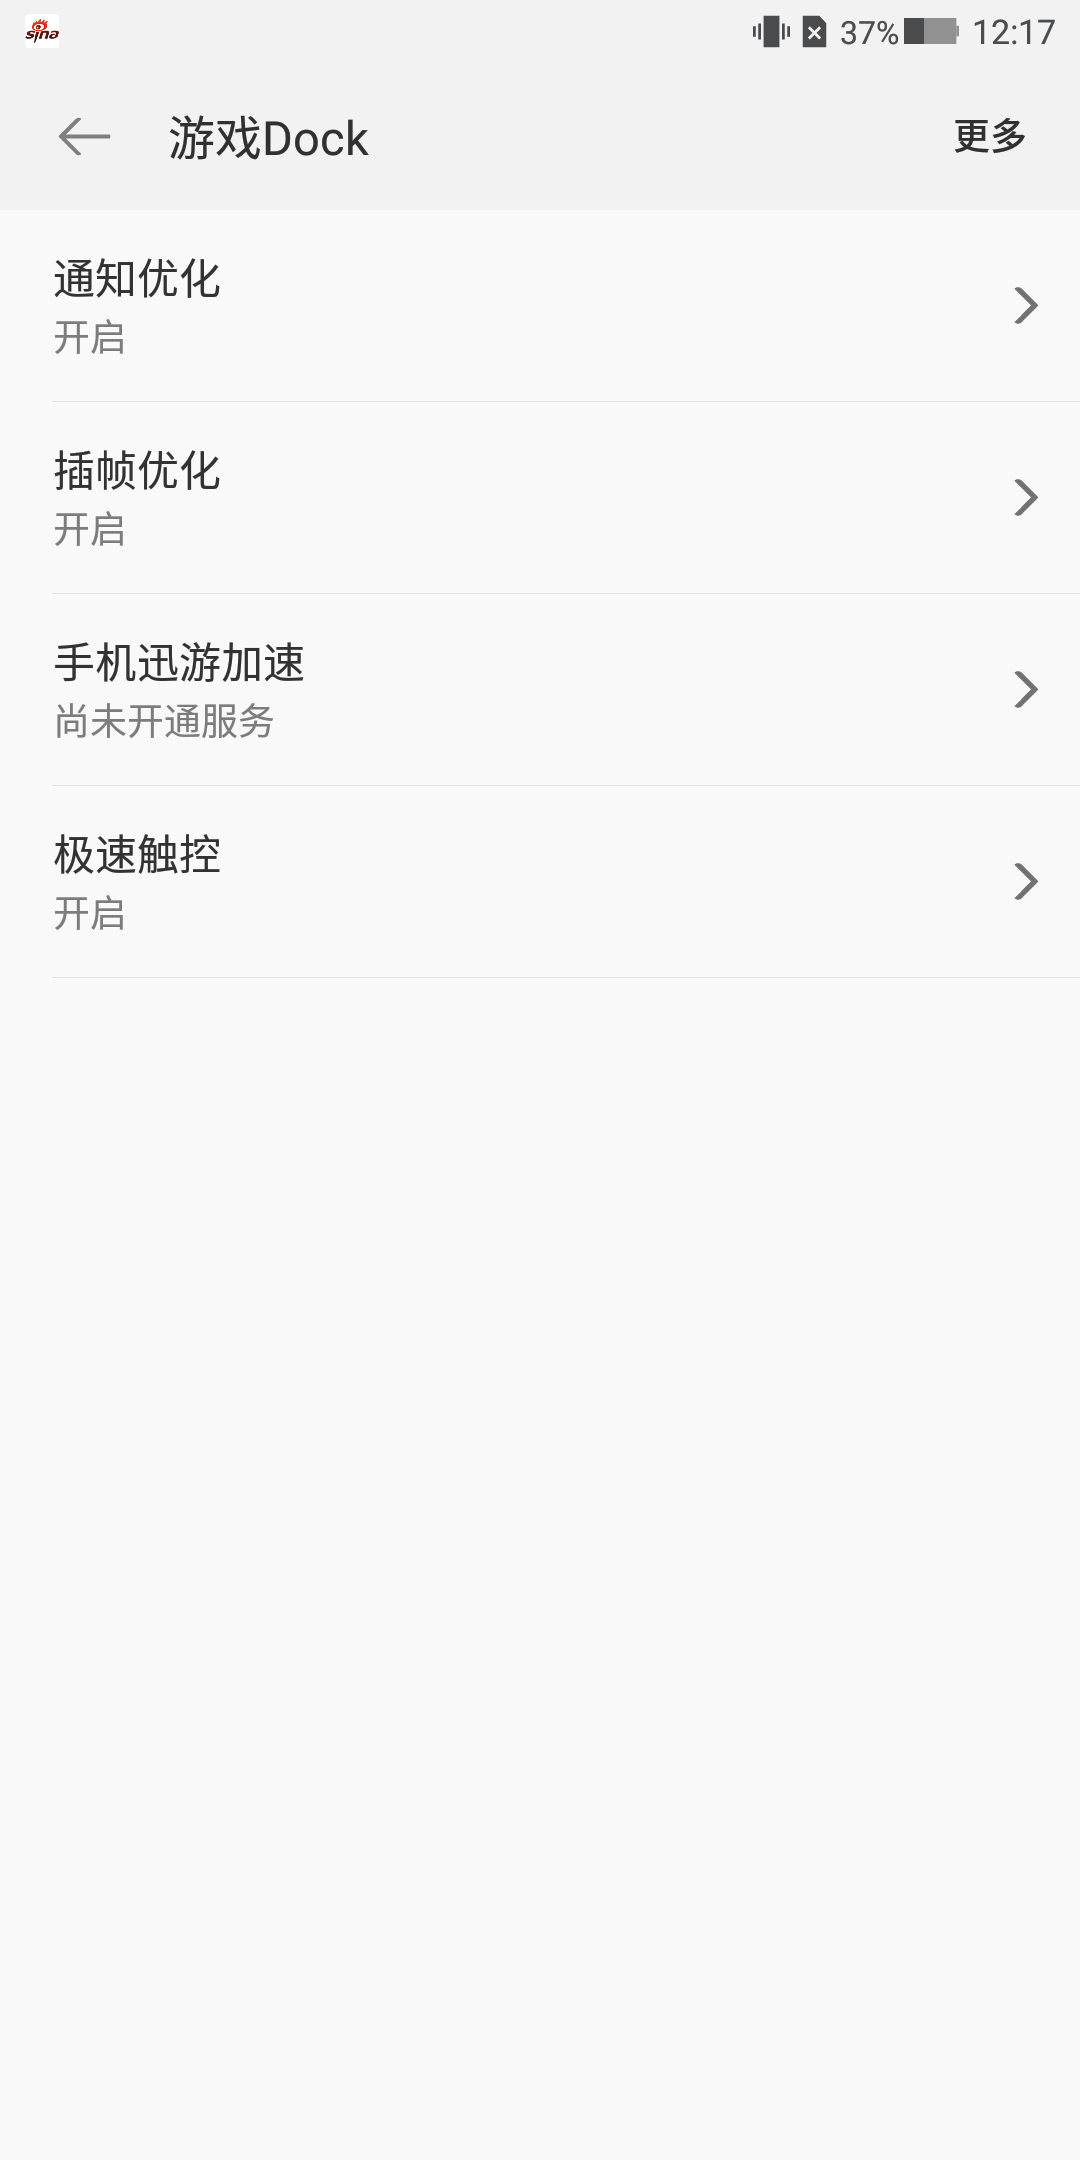 Screenshot_2018-04-27-12-17-56-734_com.blackshark.png